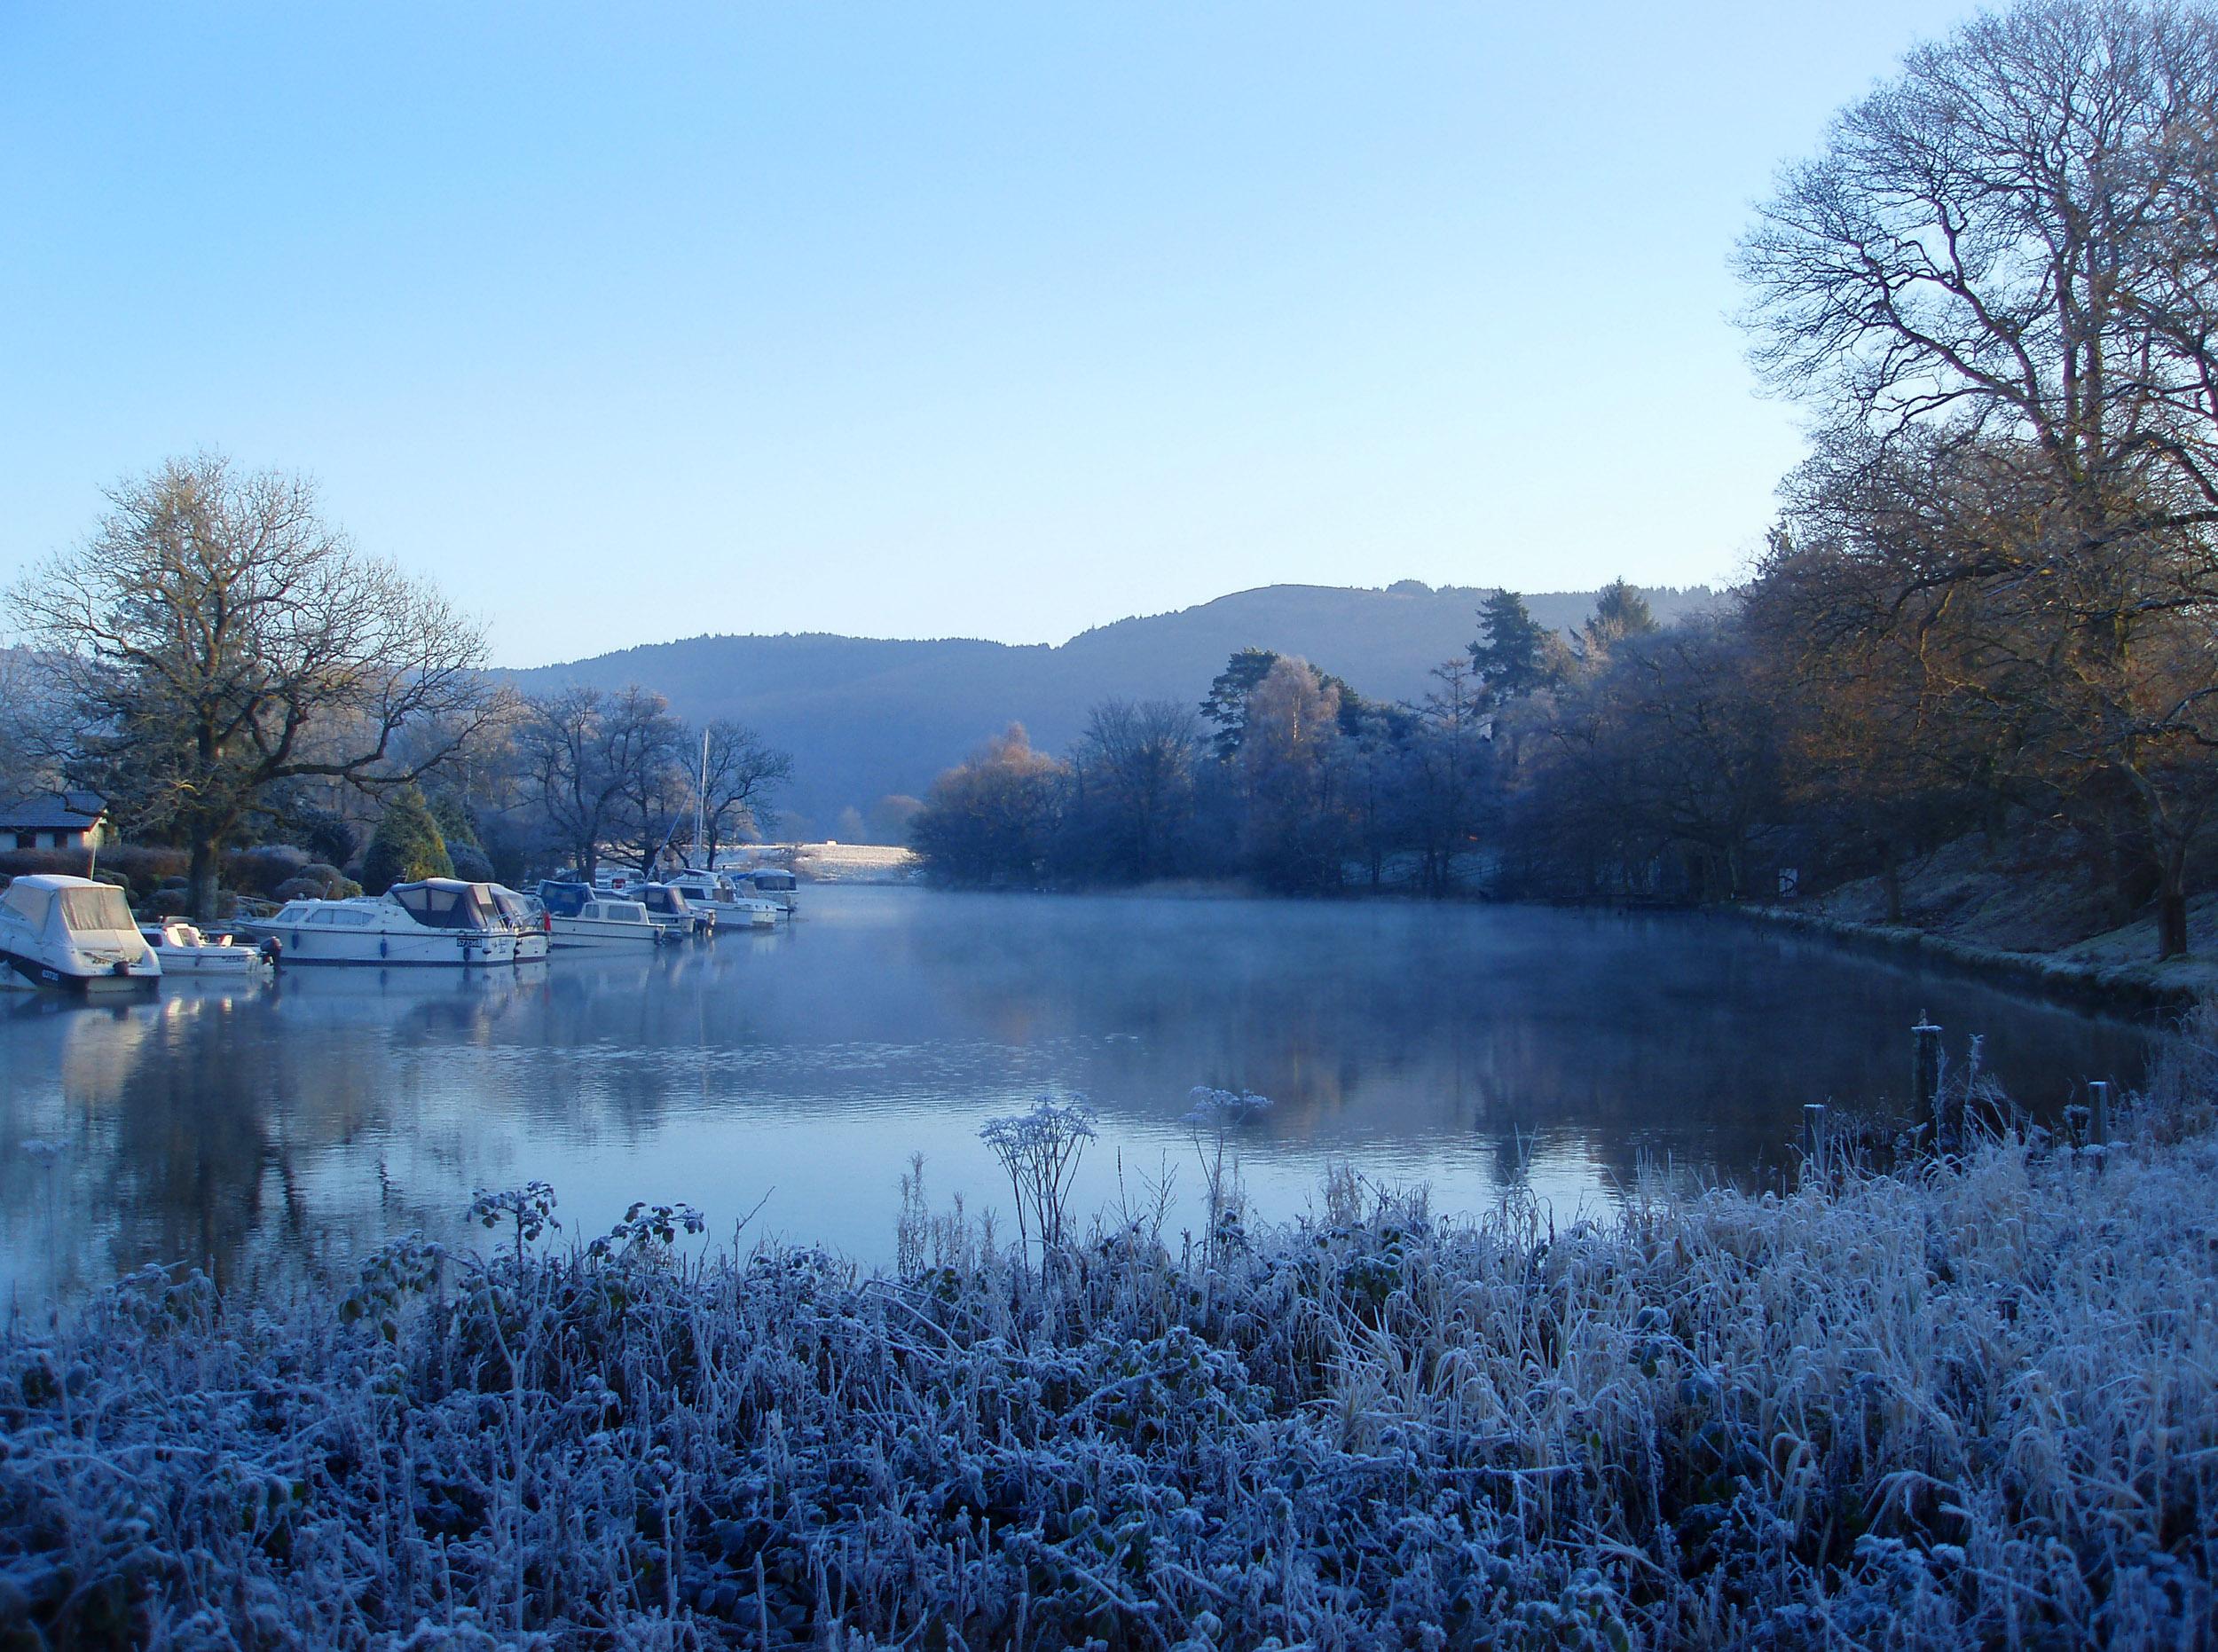 frosty winter morning Desktop Wallpaper iskincouk 2500x1862